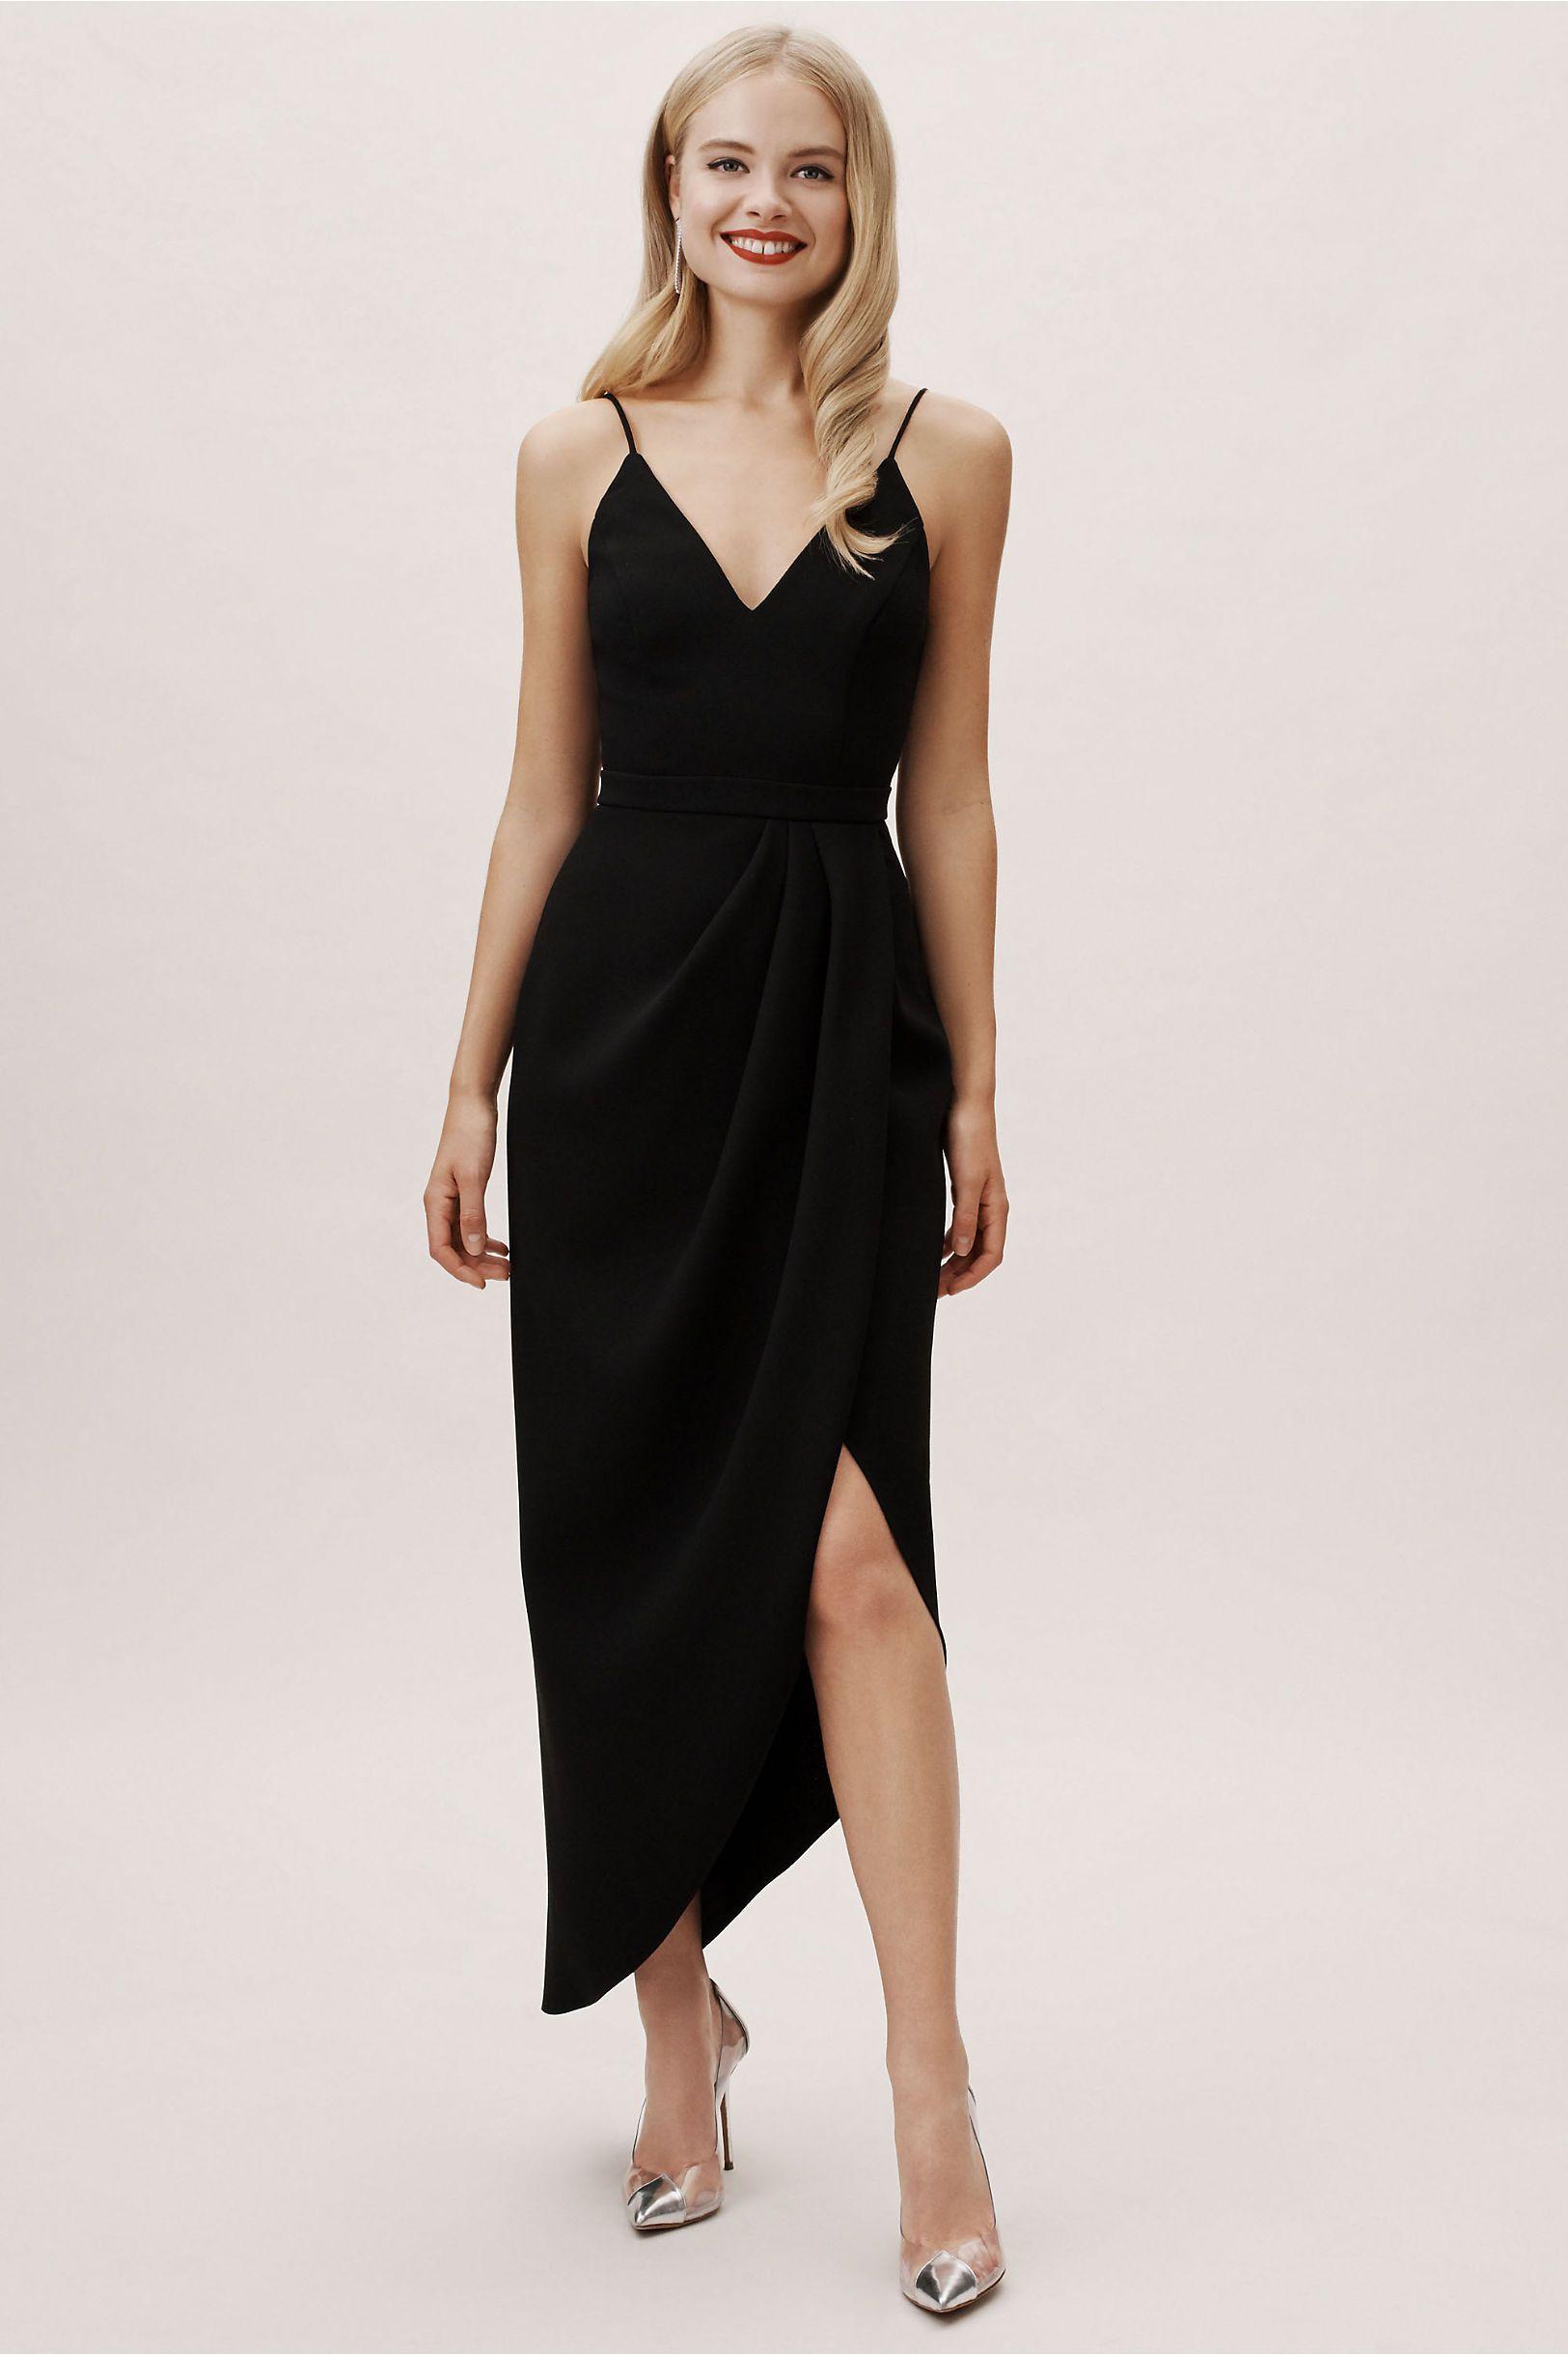 Caron V Neck Crepe Dress Black Bridesmaid Dresses Dress To Hide Belly Midi Bridesmaid Dress [ 2440 x 1625 Pixel ]